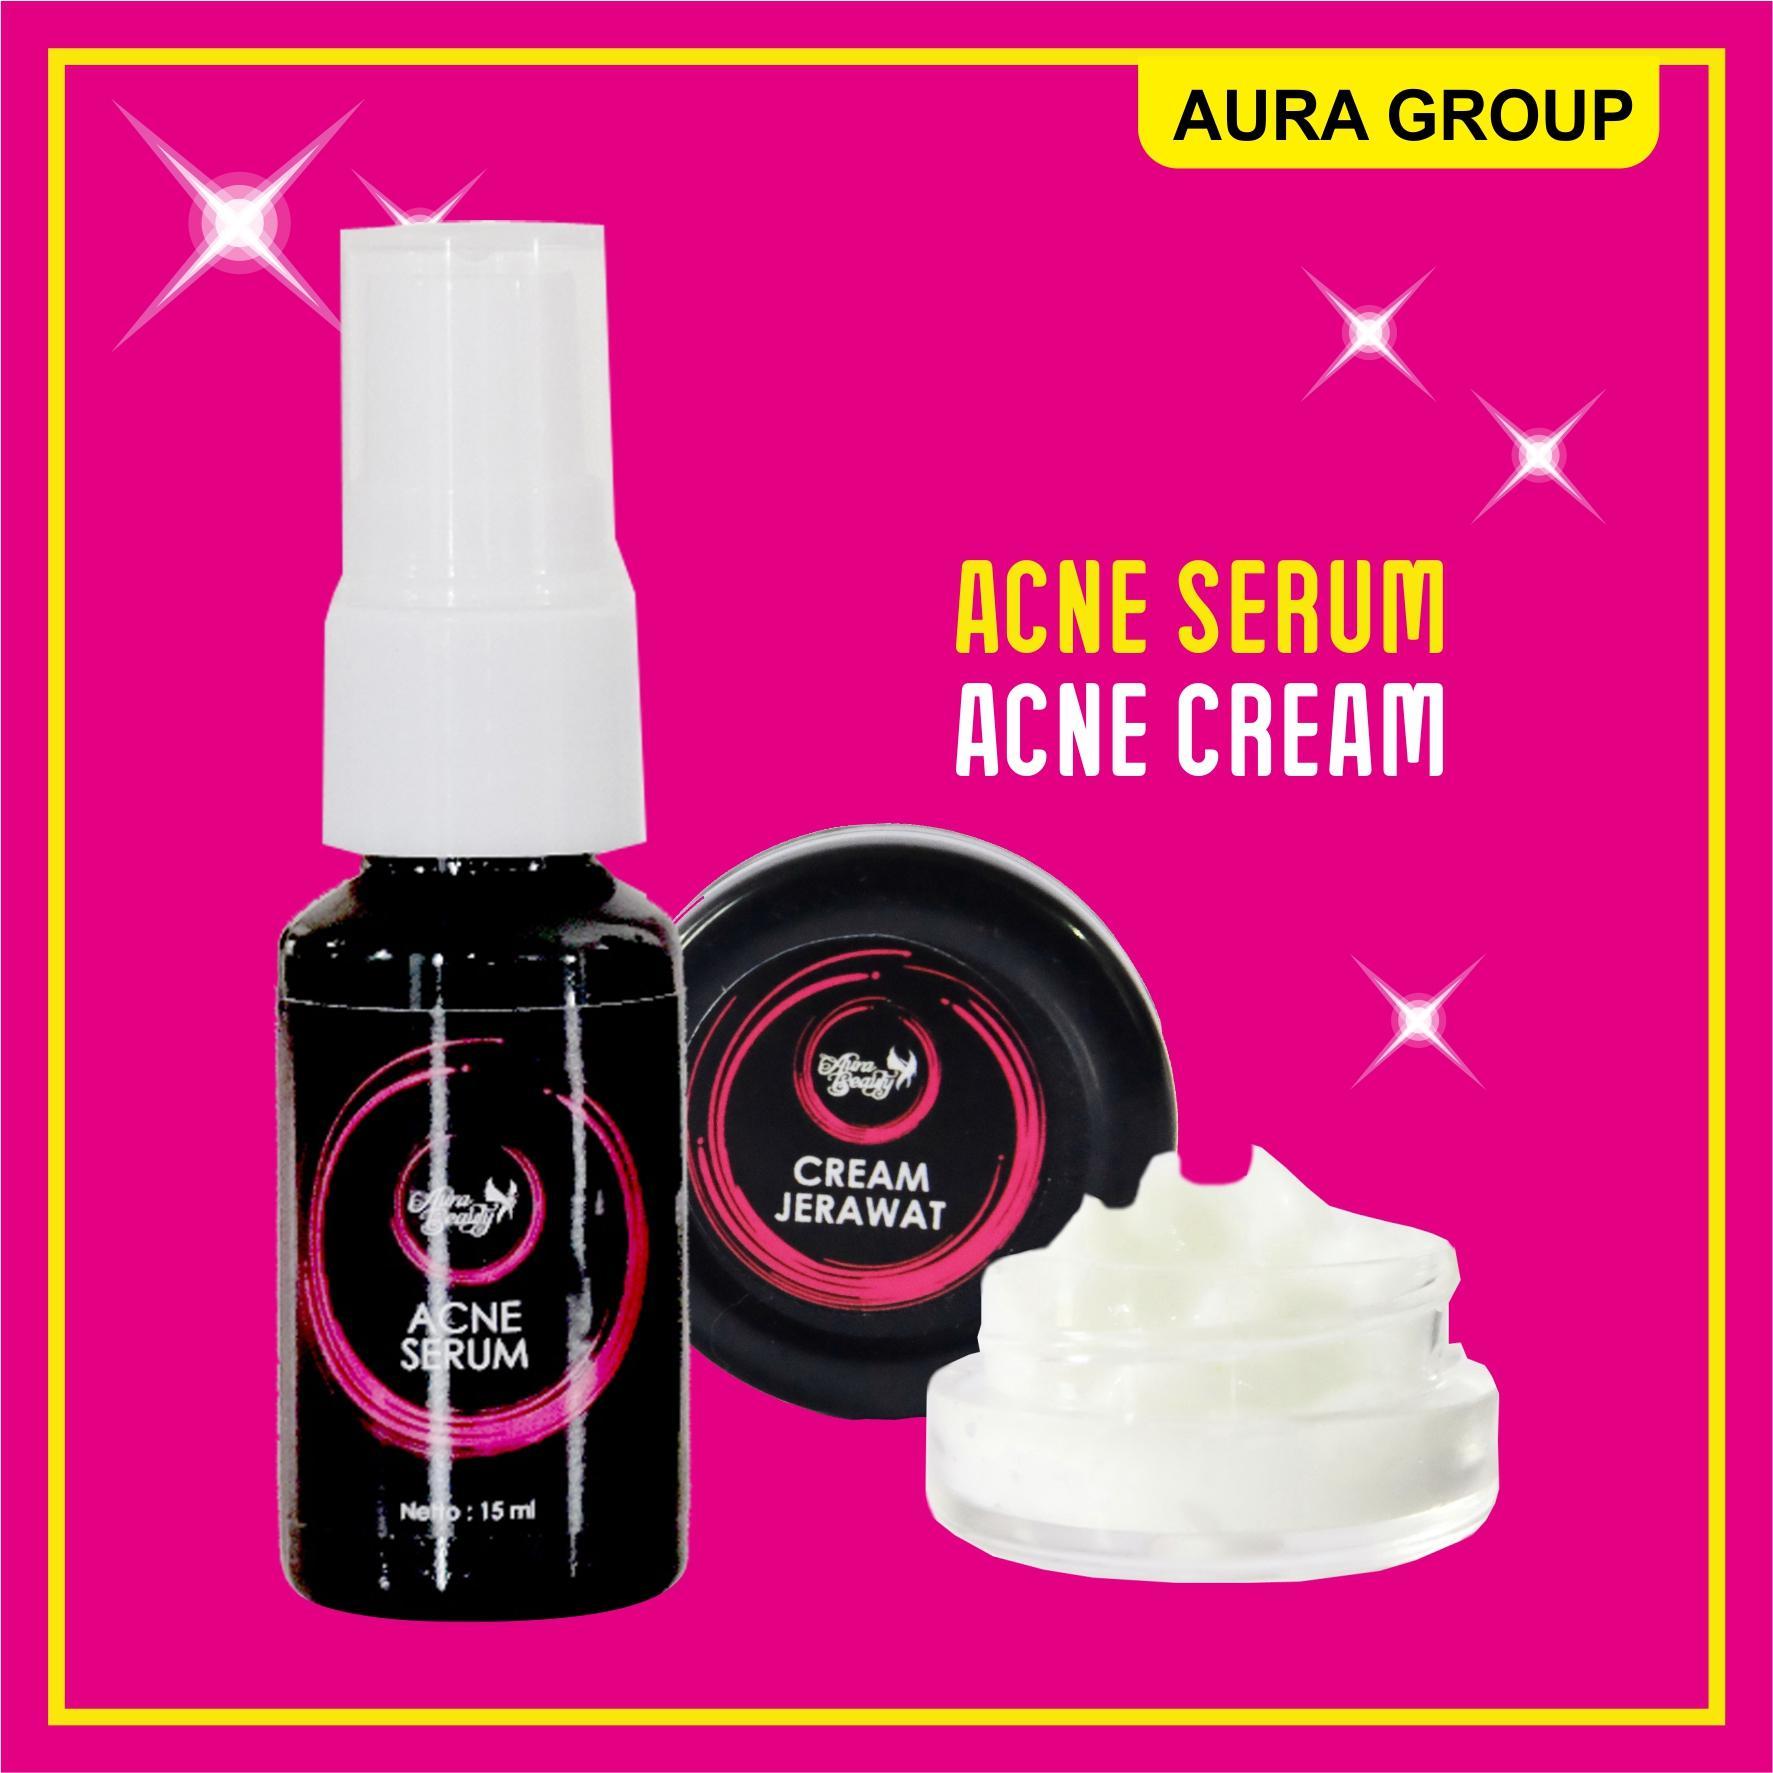 Aura Beauty - Serum Jerawat dan Krim Jerawat Terbaik 5 gram Ampuh Menghilangkan Jerawat